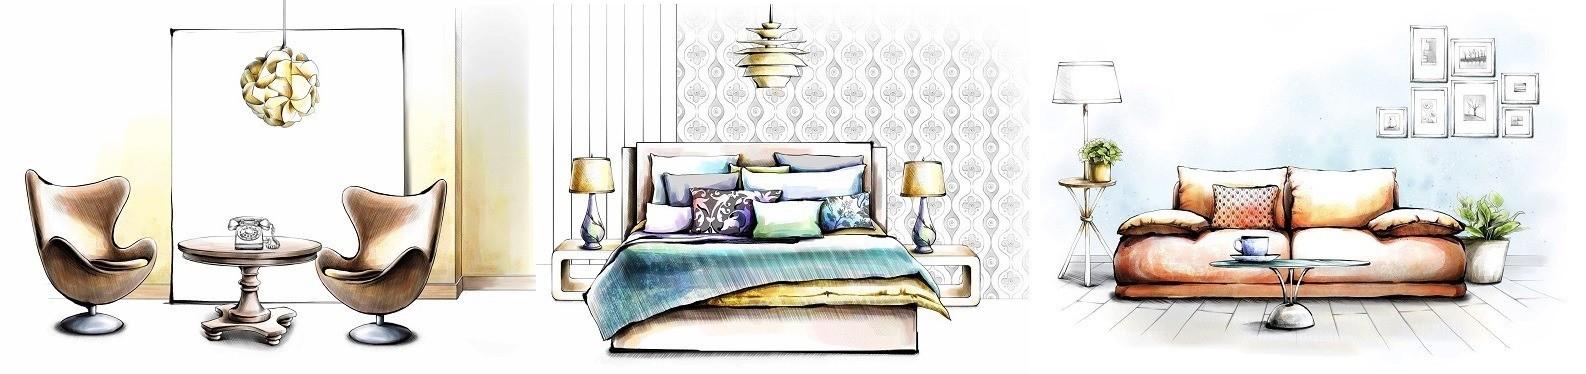 Sofa dizayn.zakazat - Мягкая мебель для кафе/ресторанов